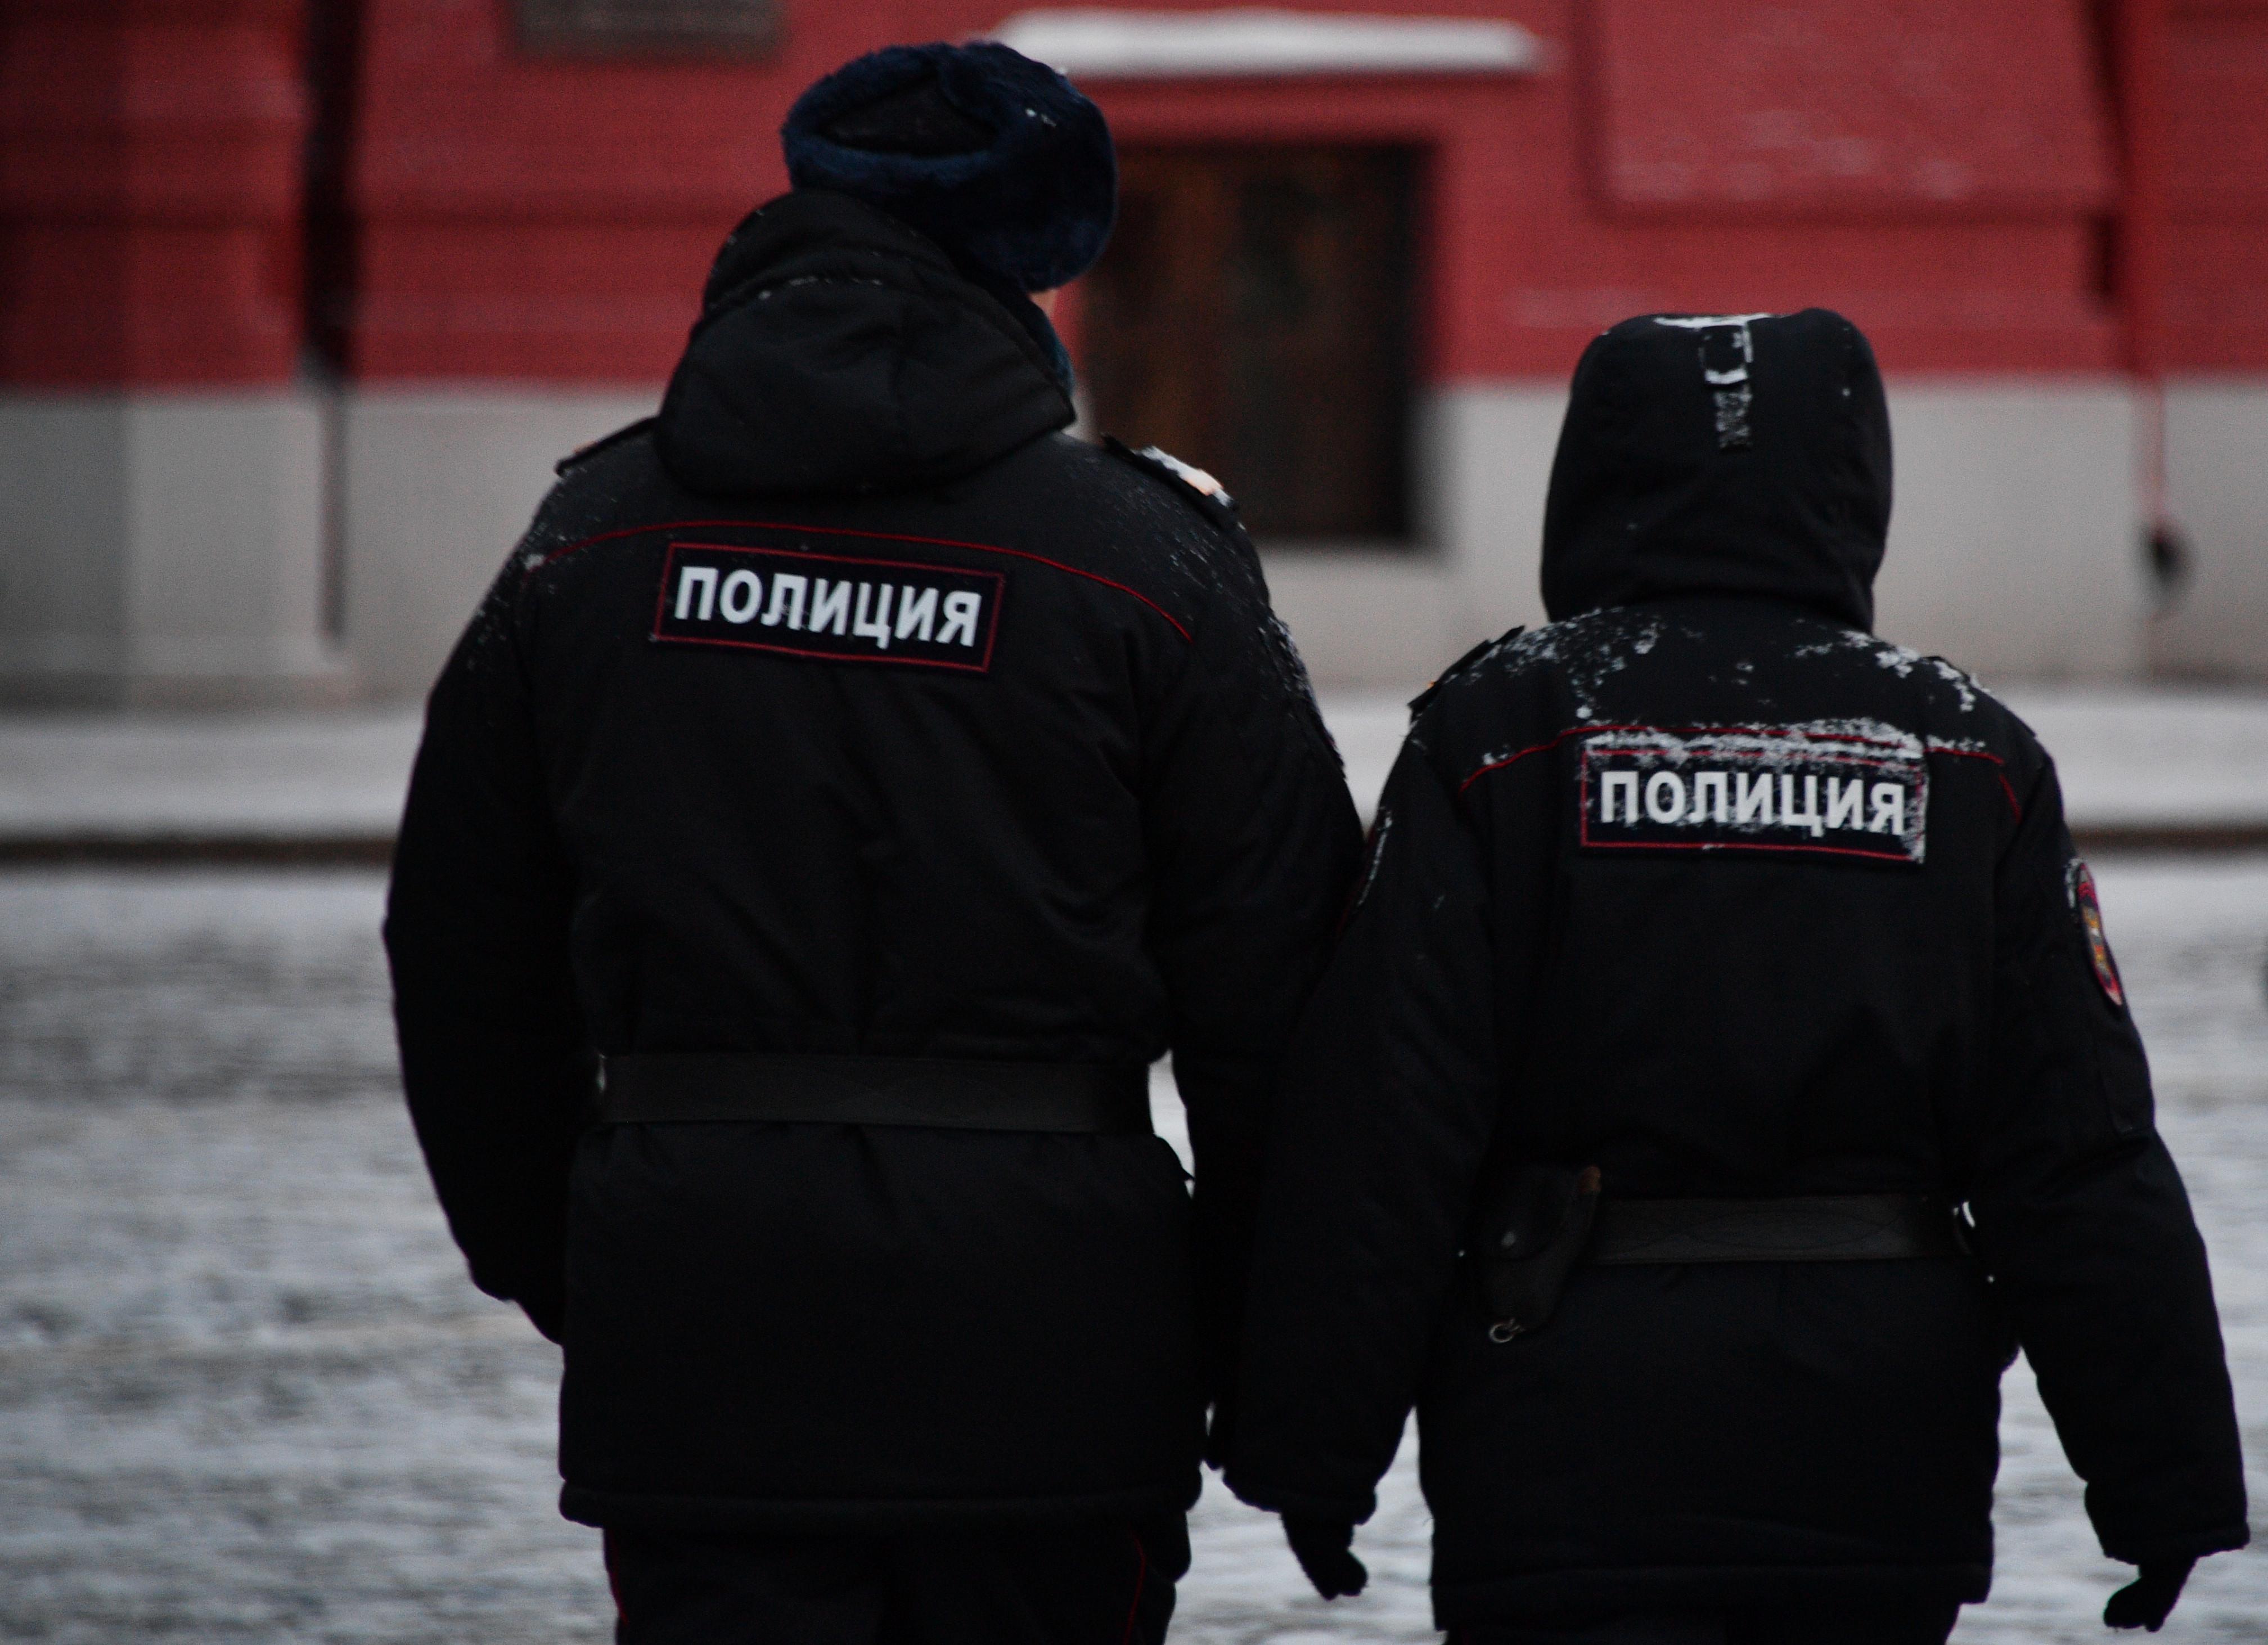 <p><span>Фото:&copy; РИА Новости/Наталья Селиверстова</span></p>